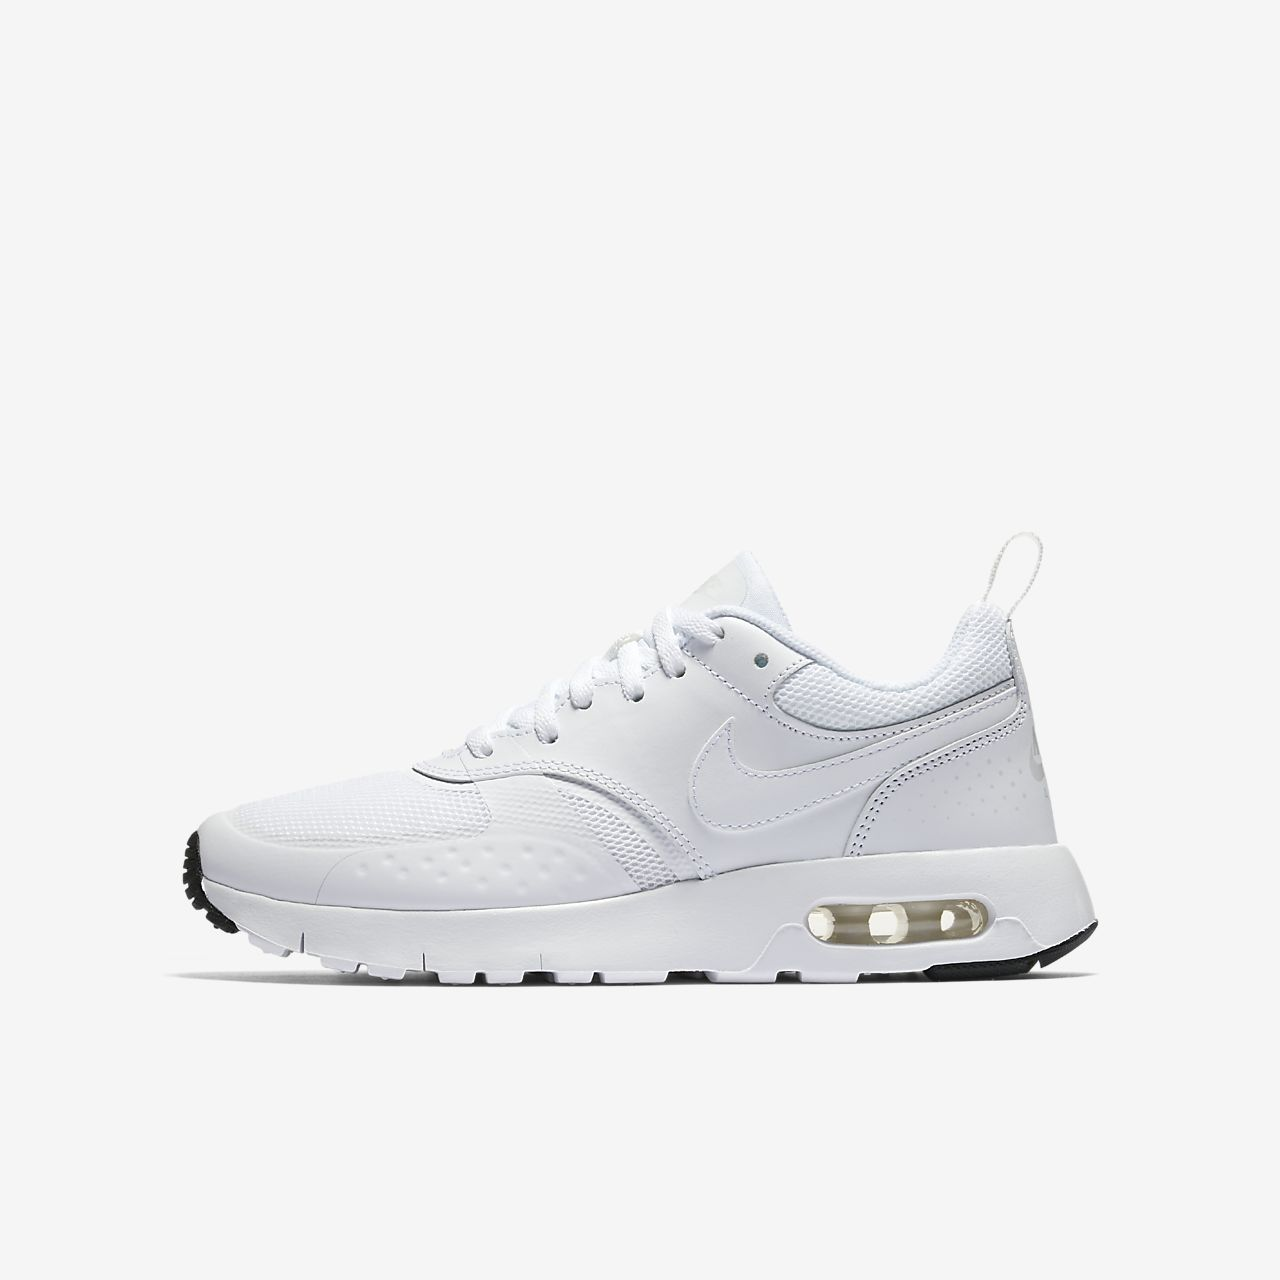 size 40 75414 0e878 Sko Nike Air Max Vision för ungdom